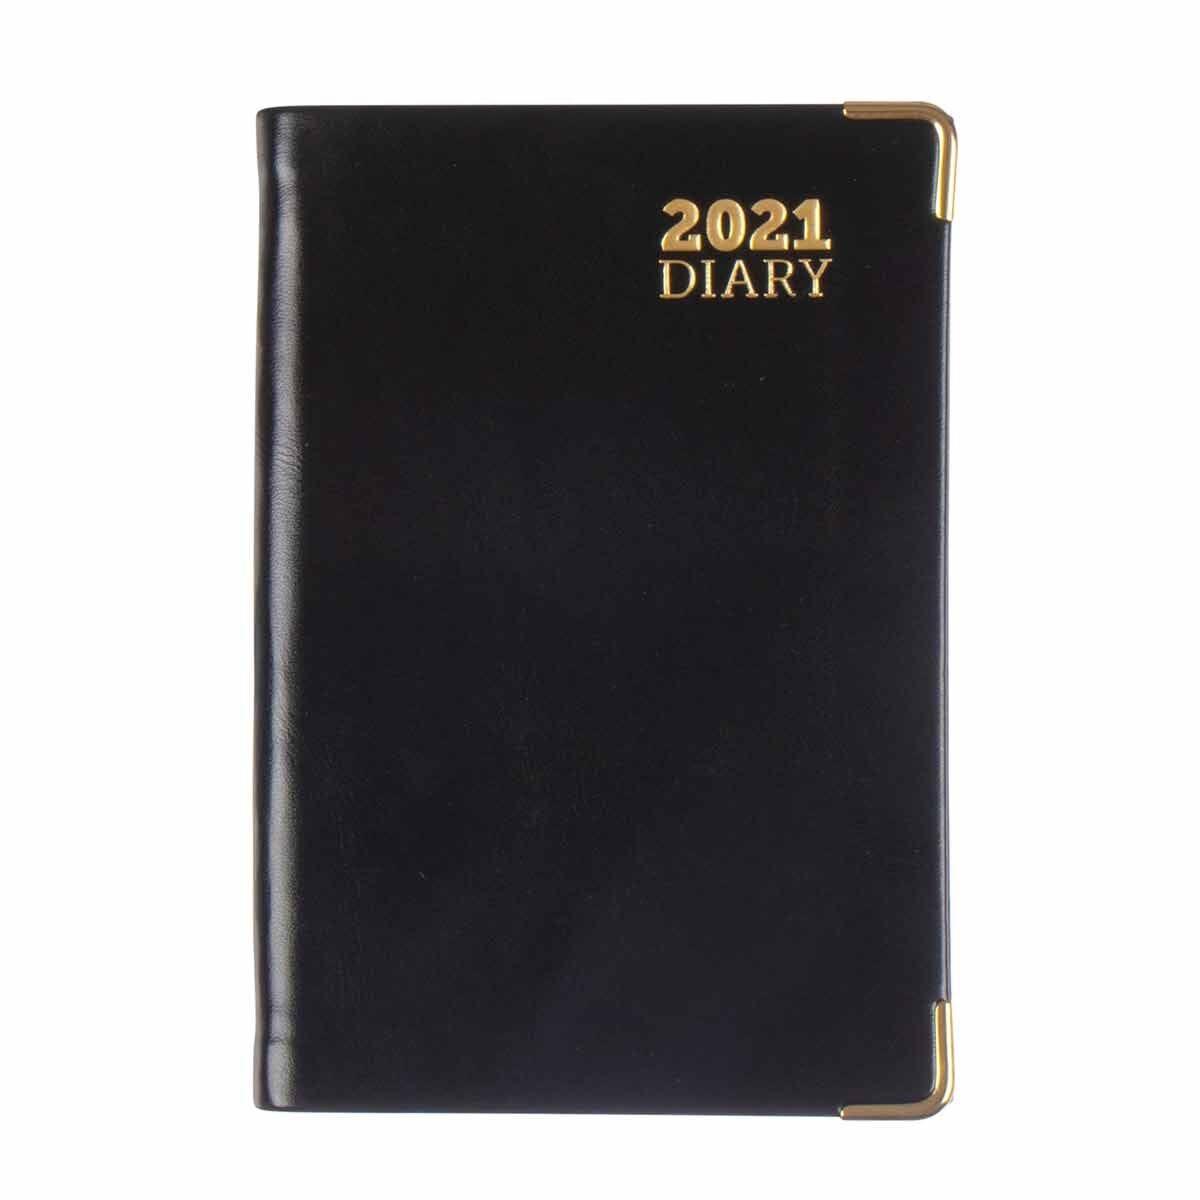 Ryman D2 Diary Week to View Pocket 2021 Black